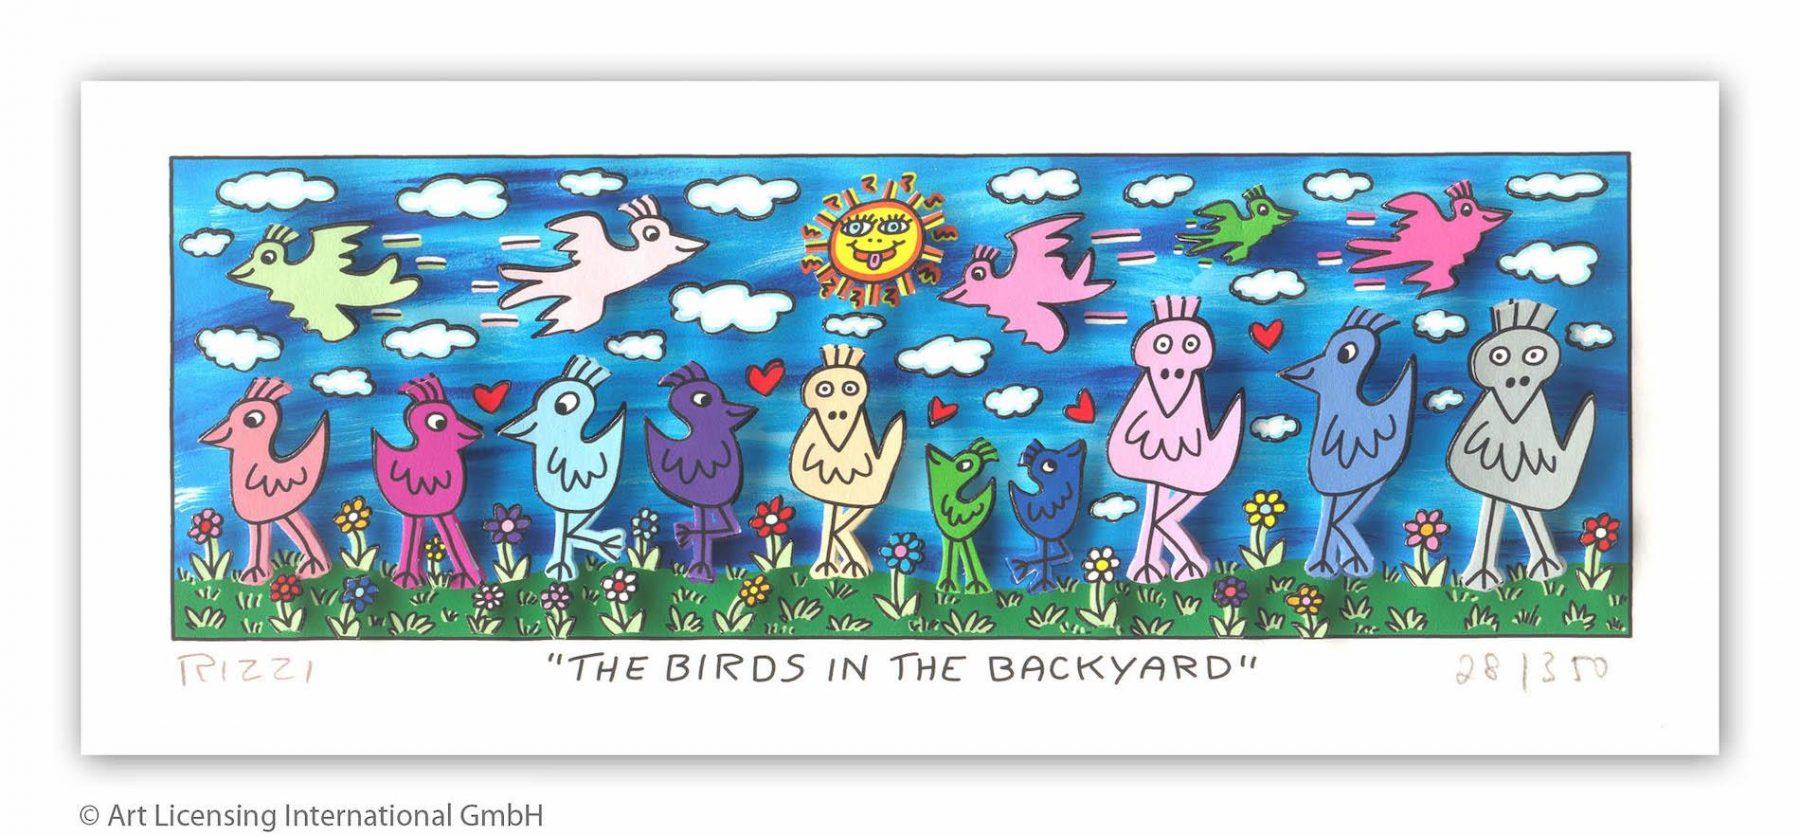 the Birds in the Backyard - Rizzi, James - k-2108RIZ2